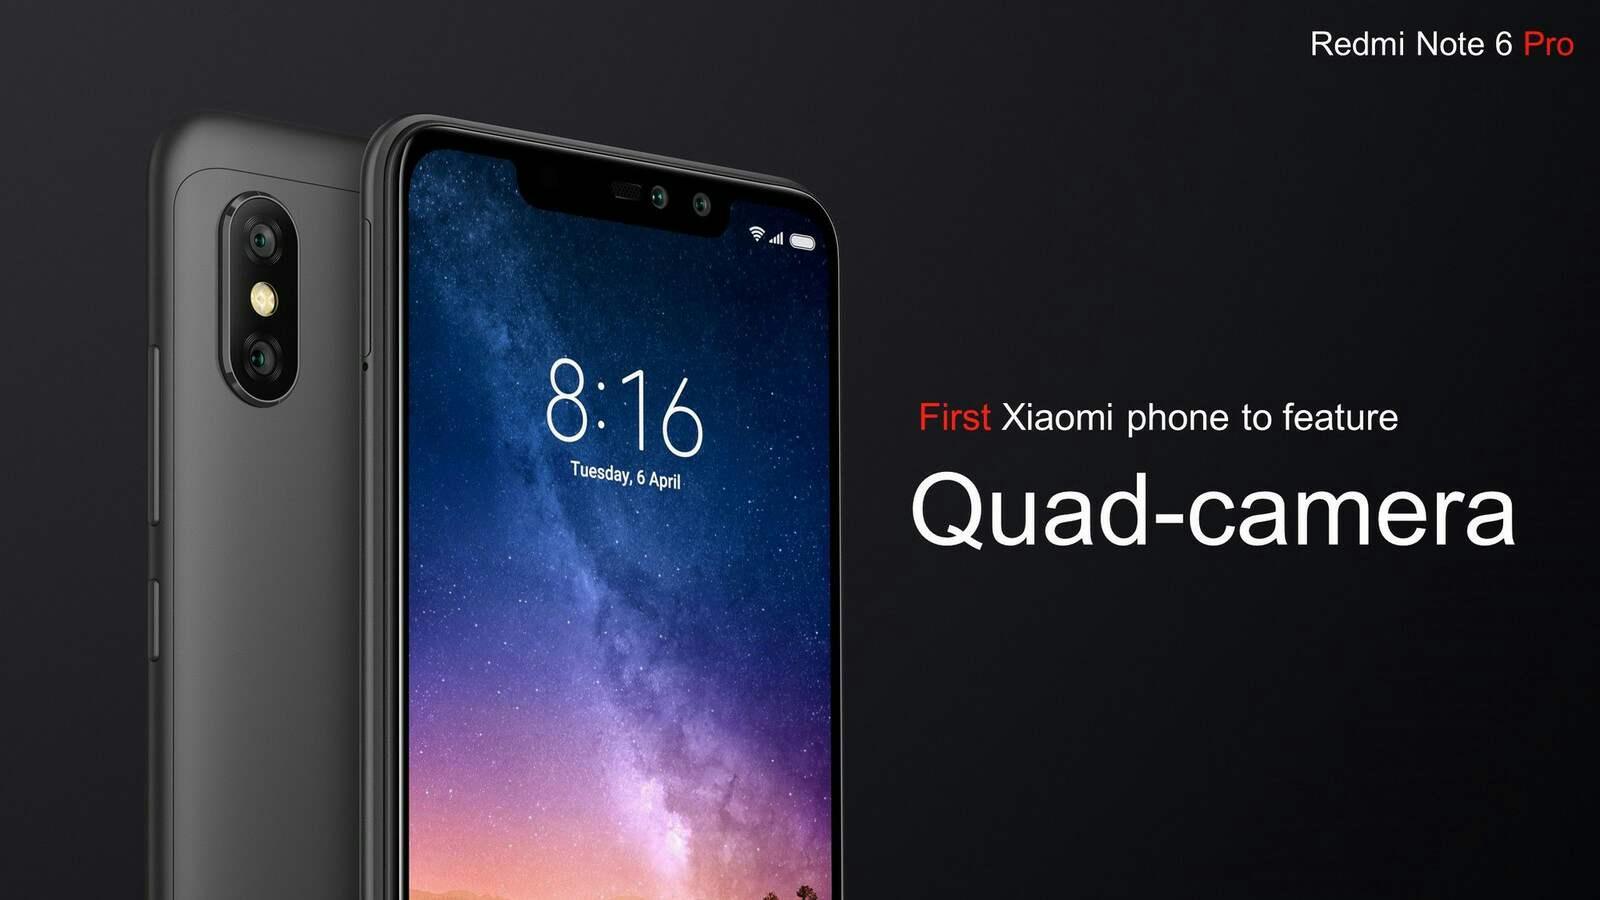 Redmi Note 6 Pro with Quad Cameras